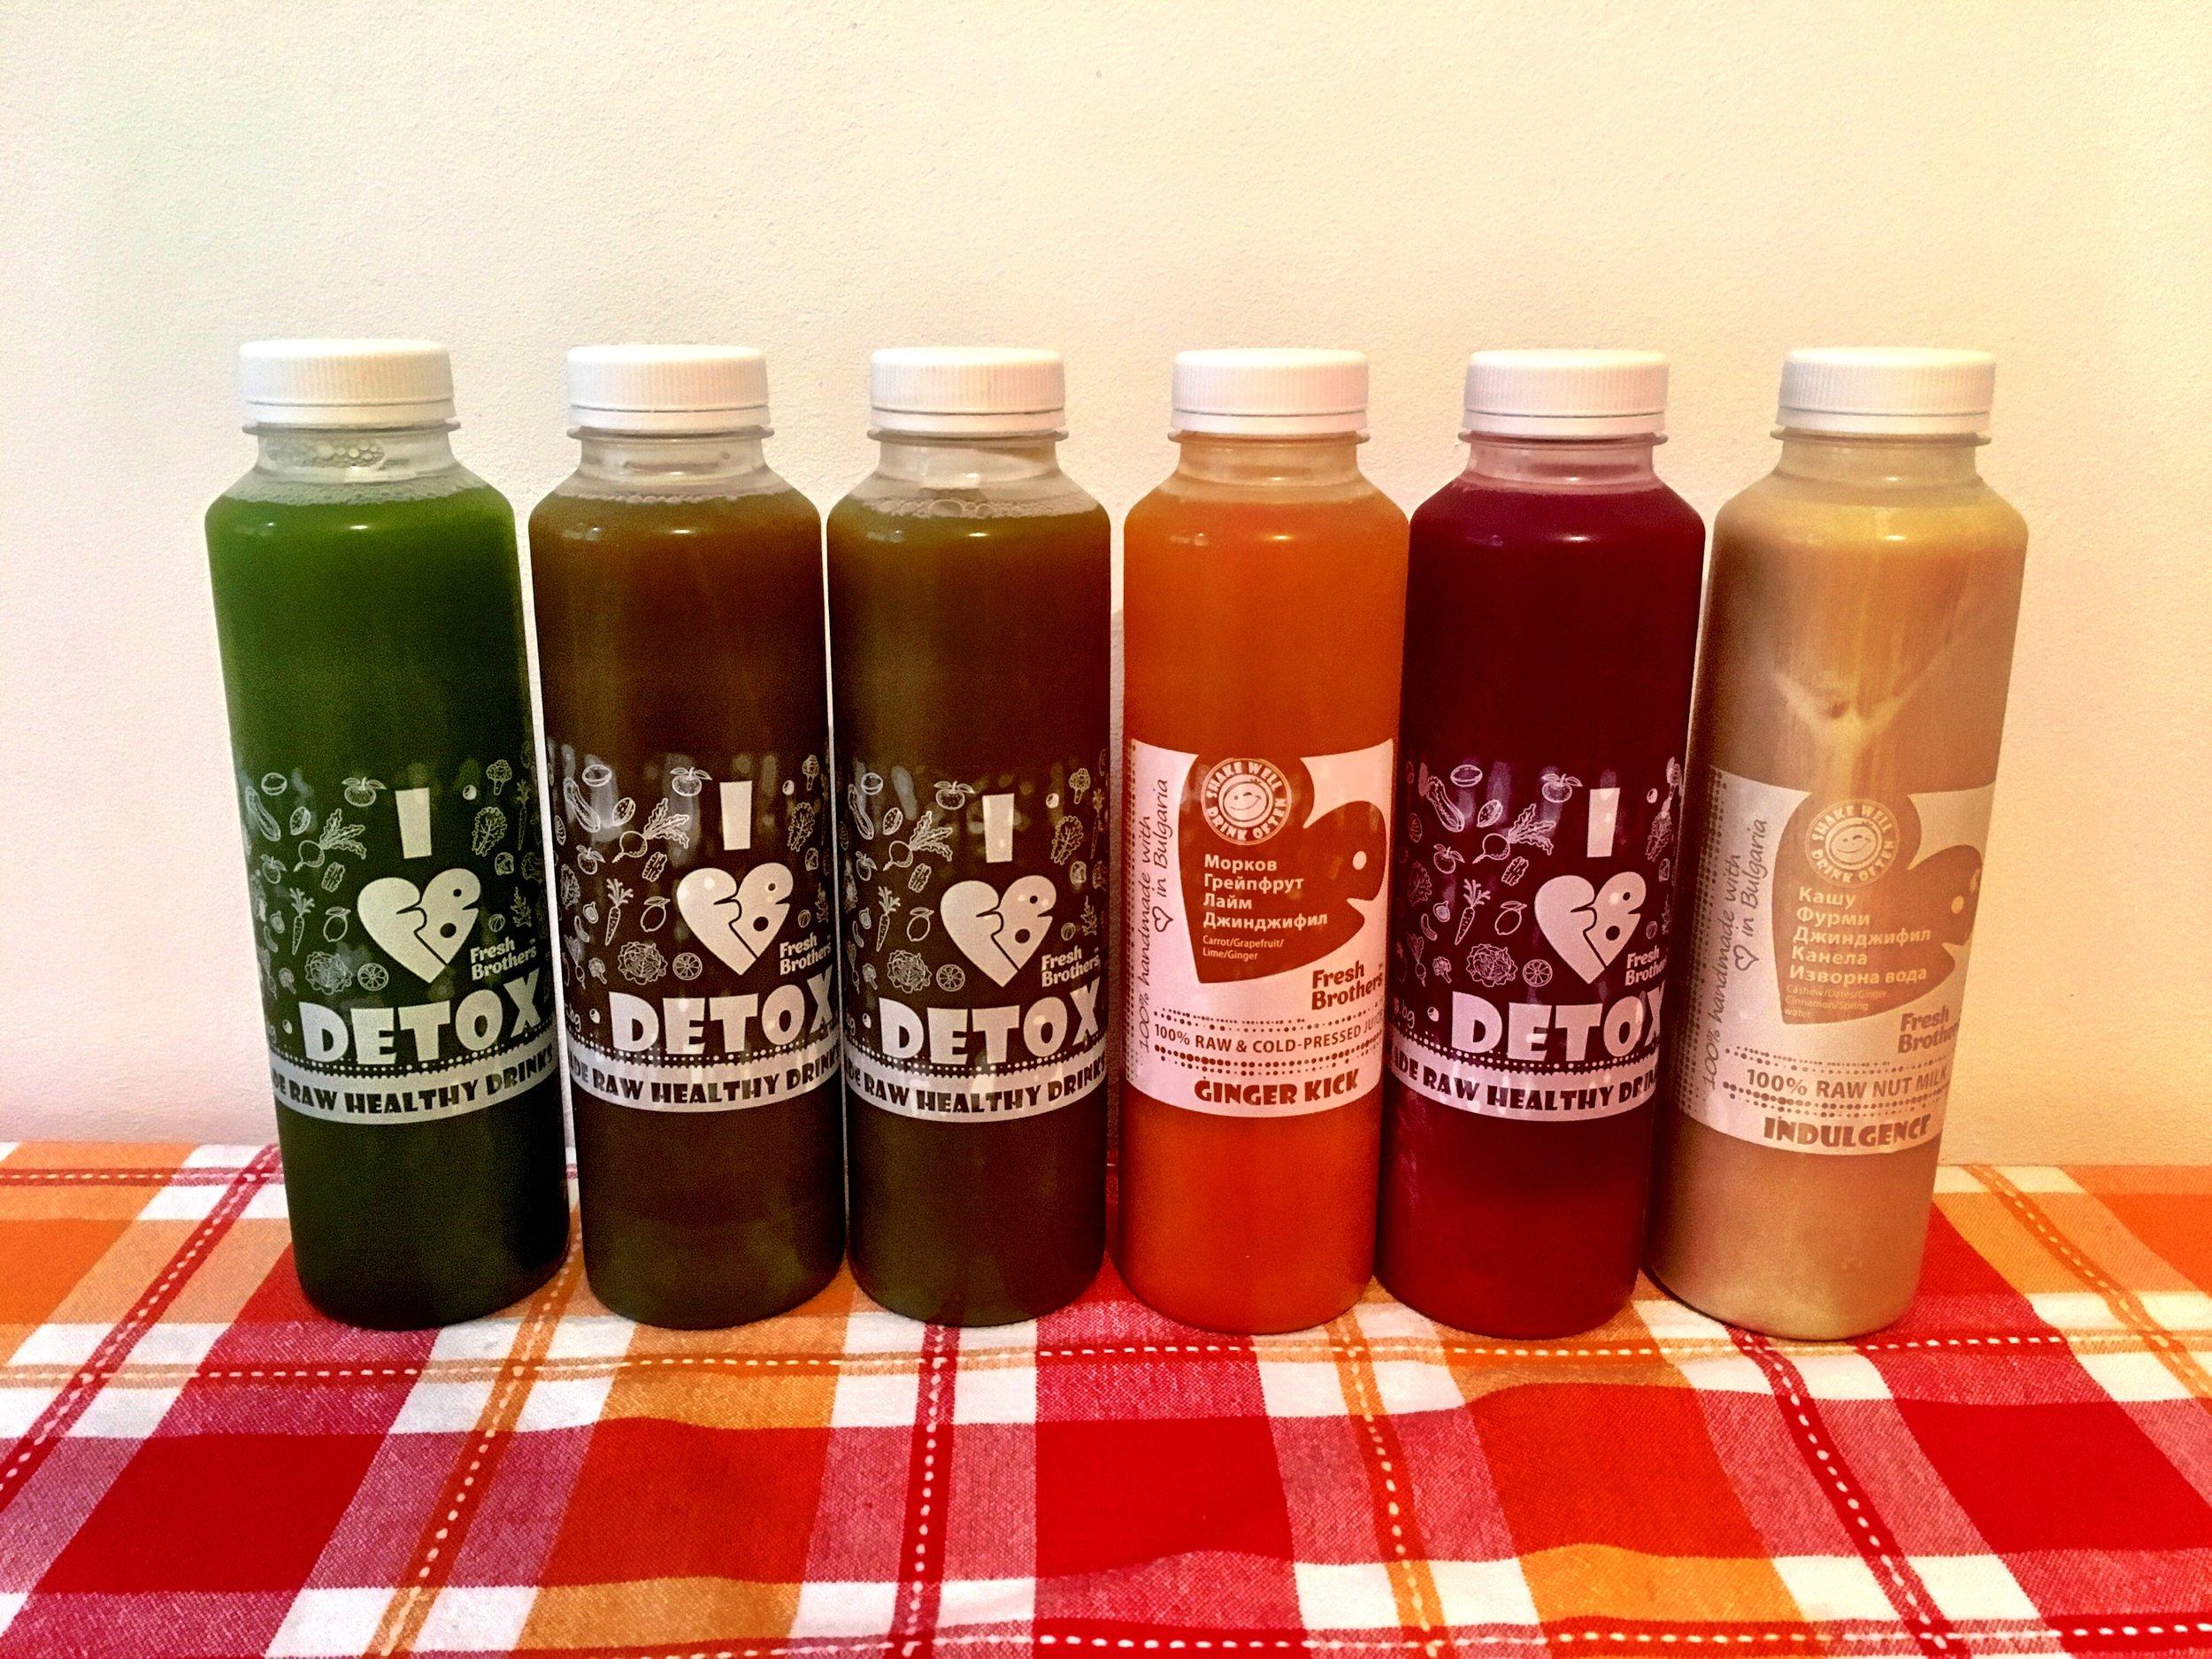 The Juice Line-up